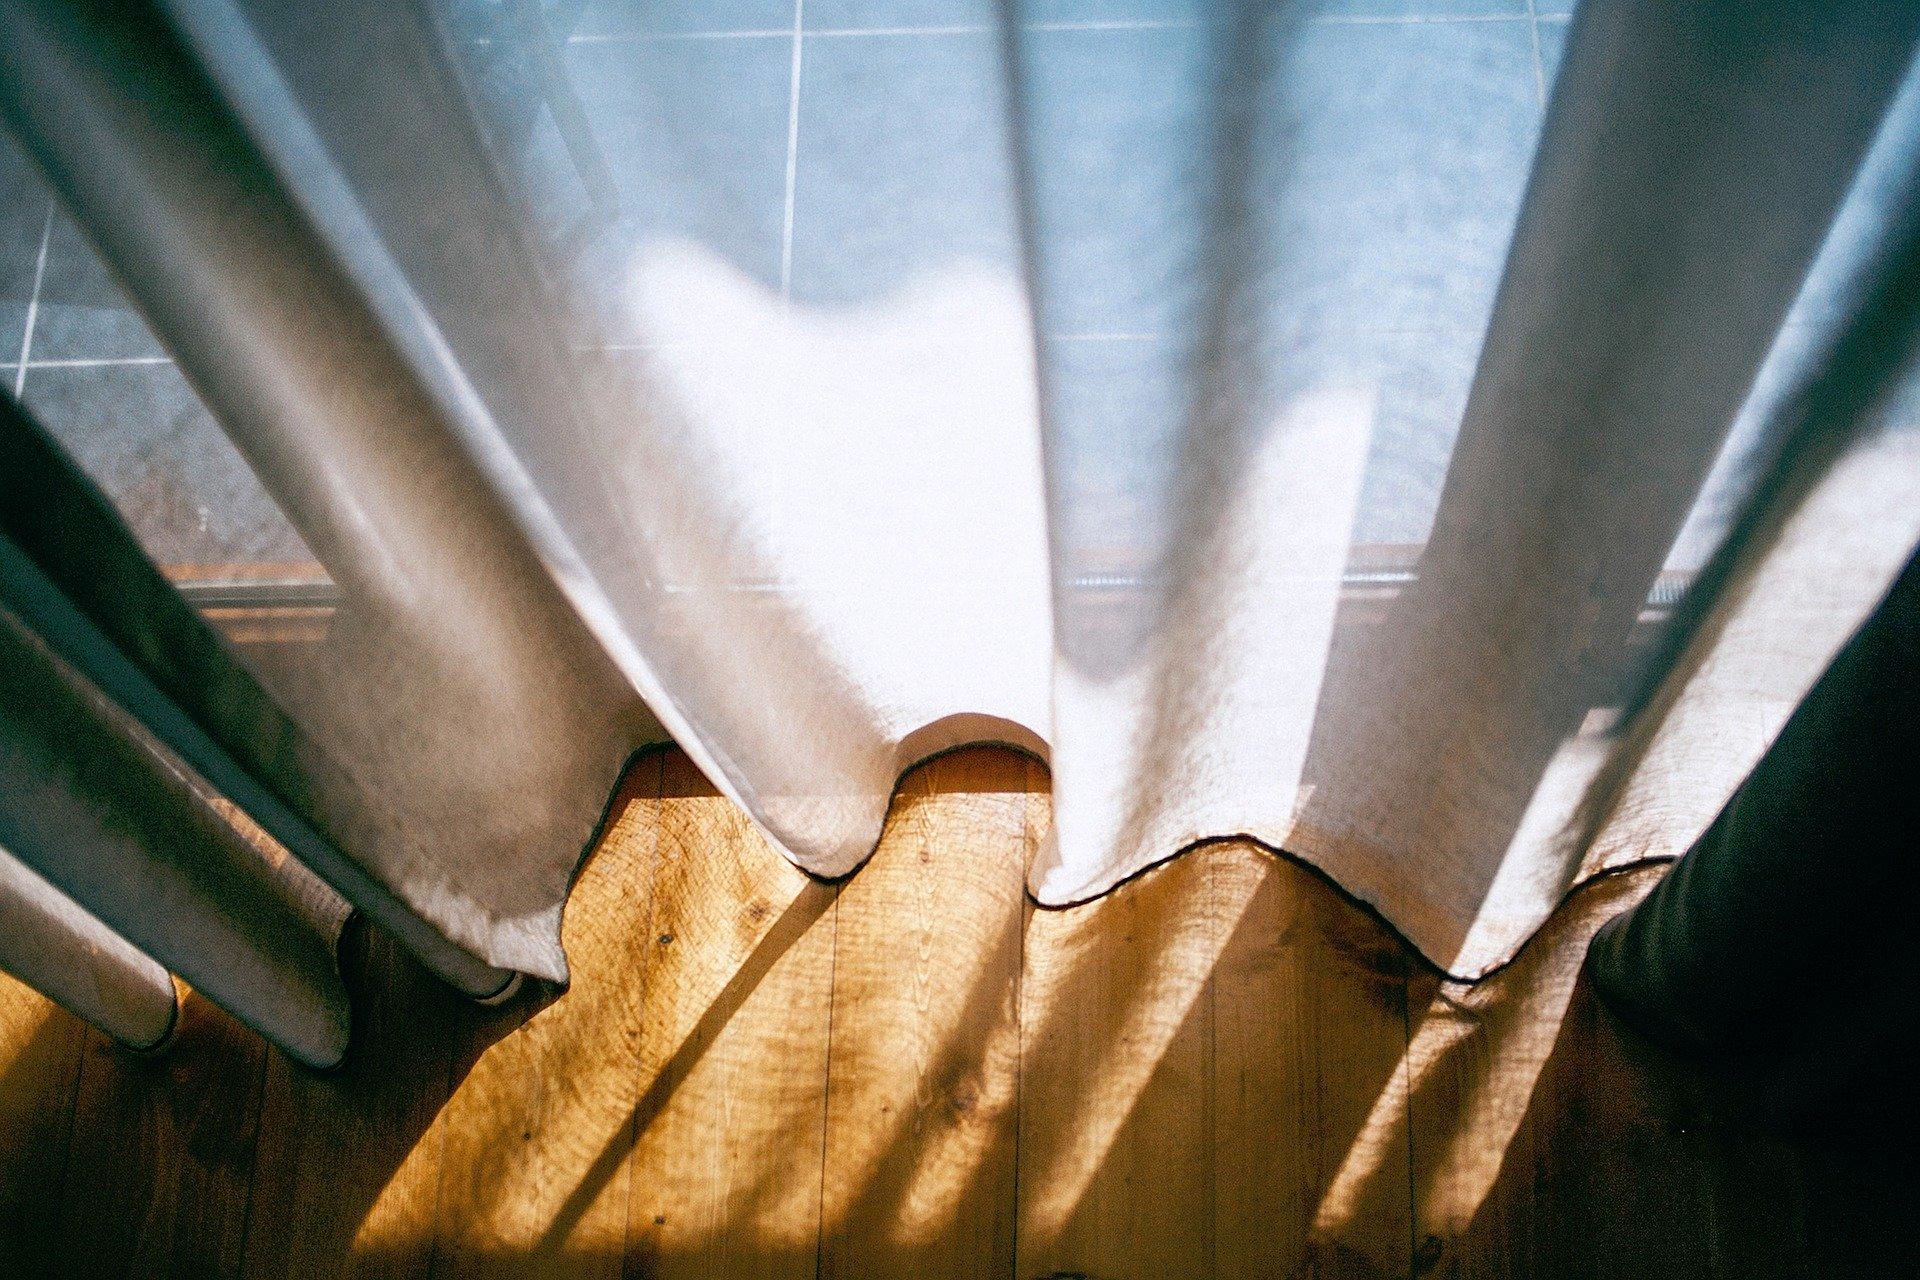 IKEAのカーテン特集!遮光タイプやレースなどおすすめアイテム紹介!